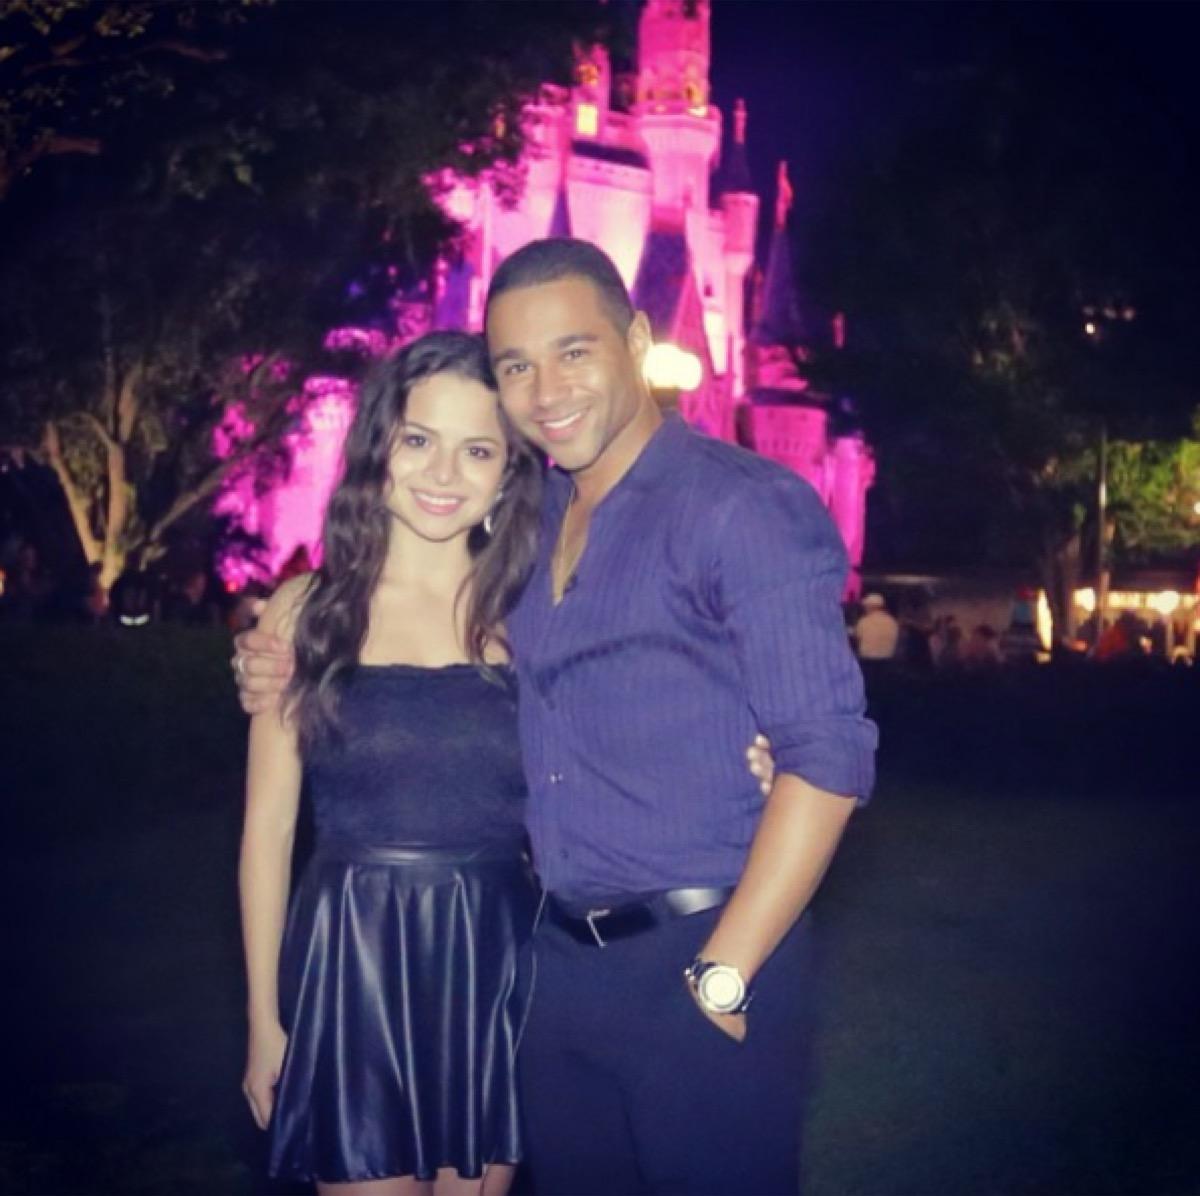 corbin bleu with girlfriend in front of castle at disney world, disney celebs